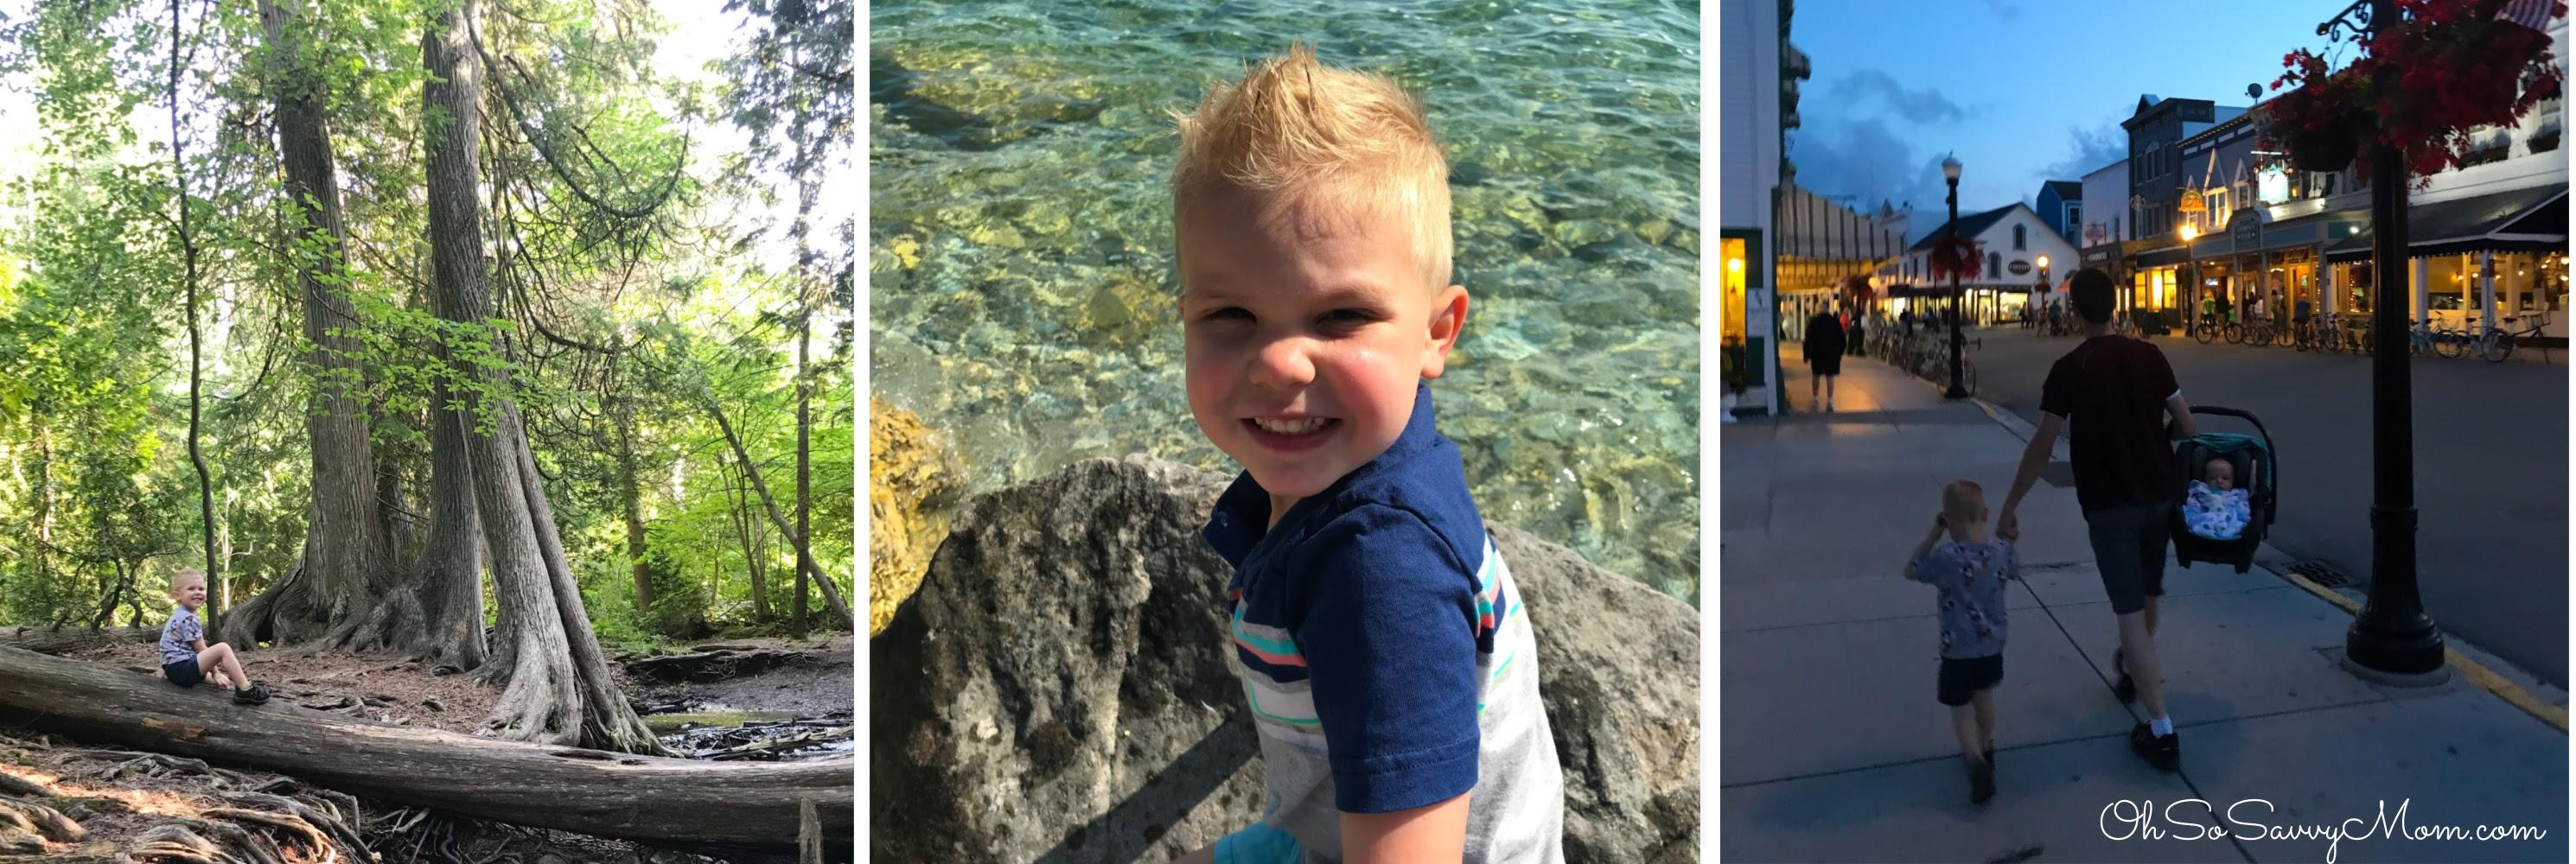 Vacationing on Mackinac Island with Kids